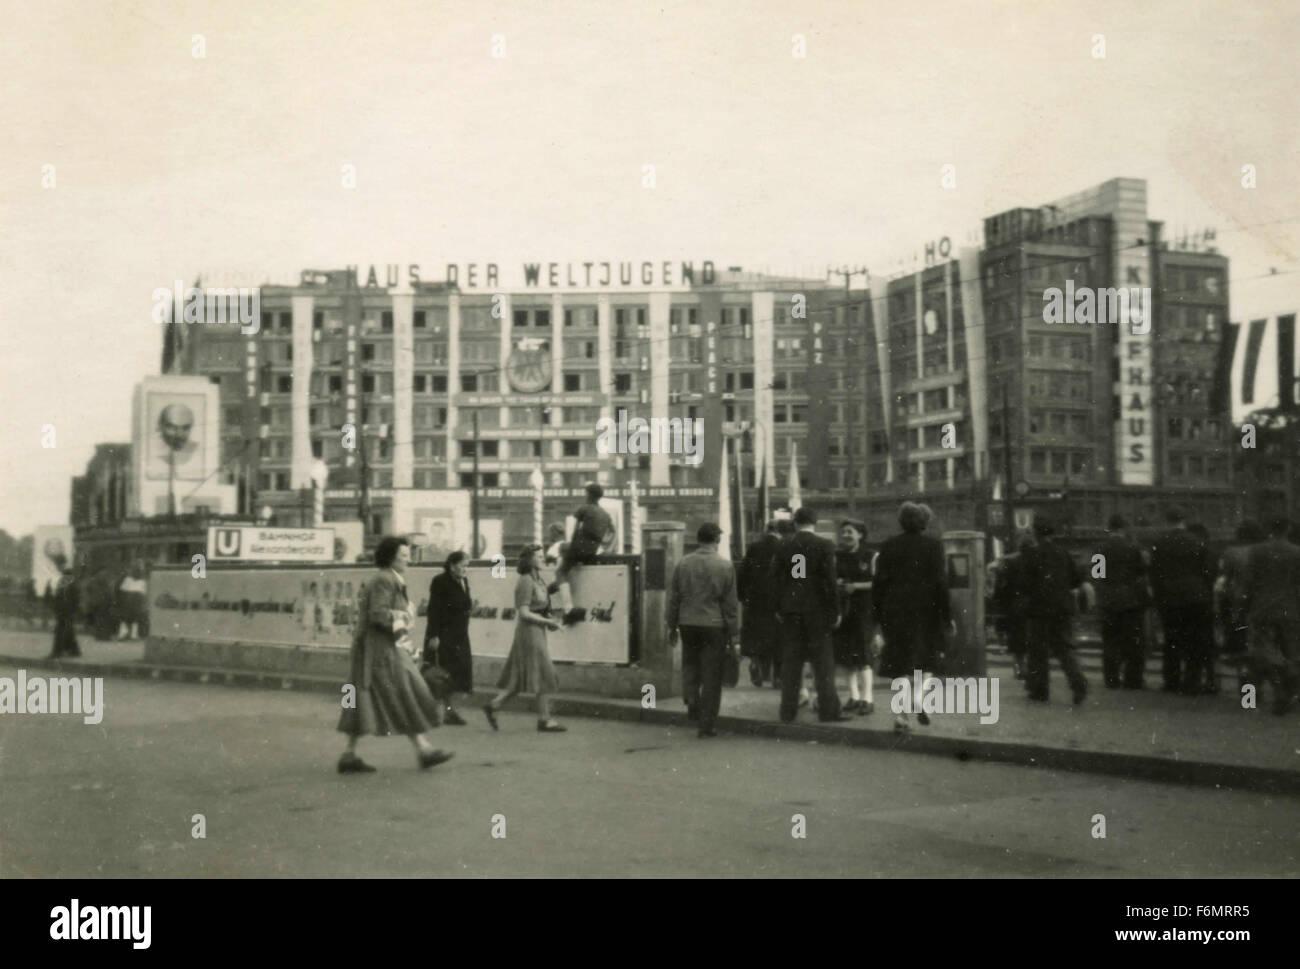 Berlin after World War II, Germany - Stock Image